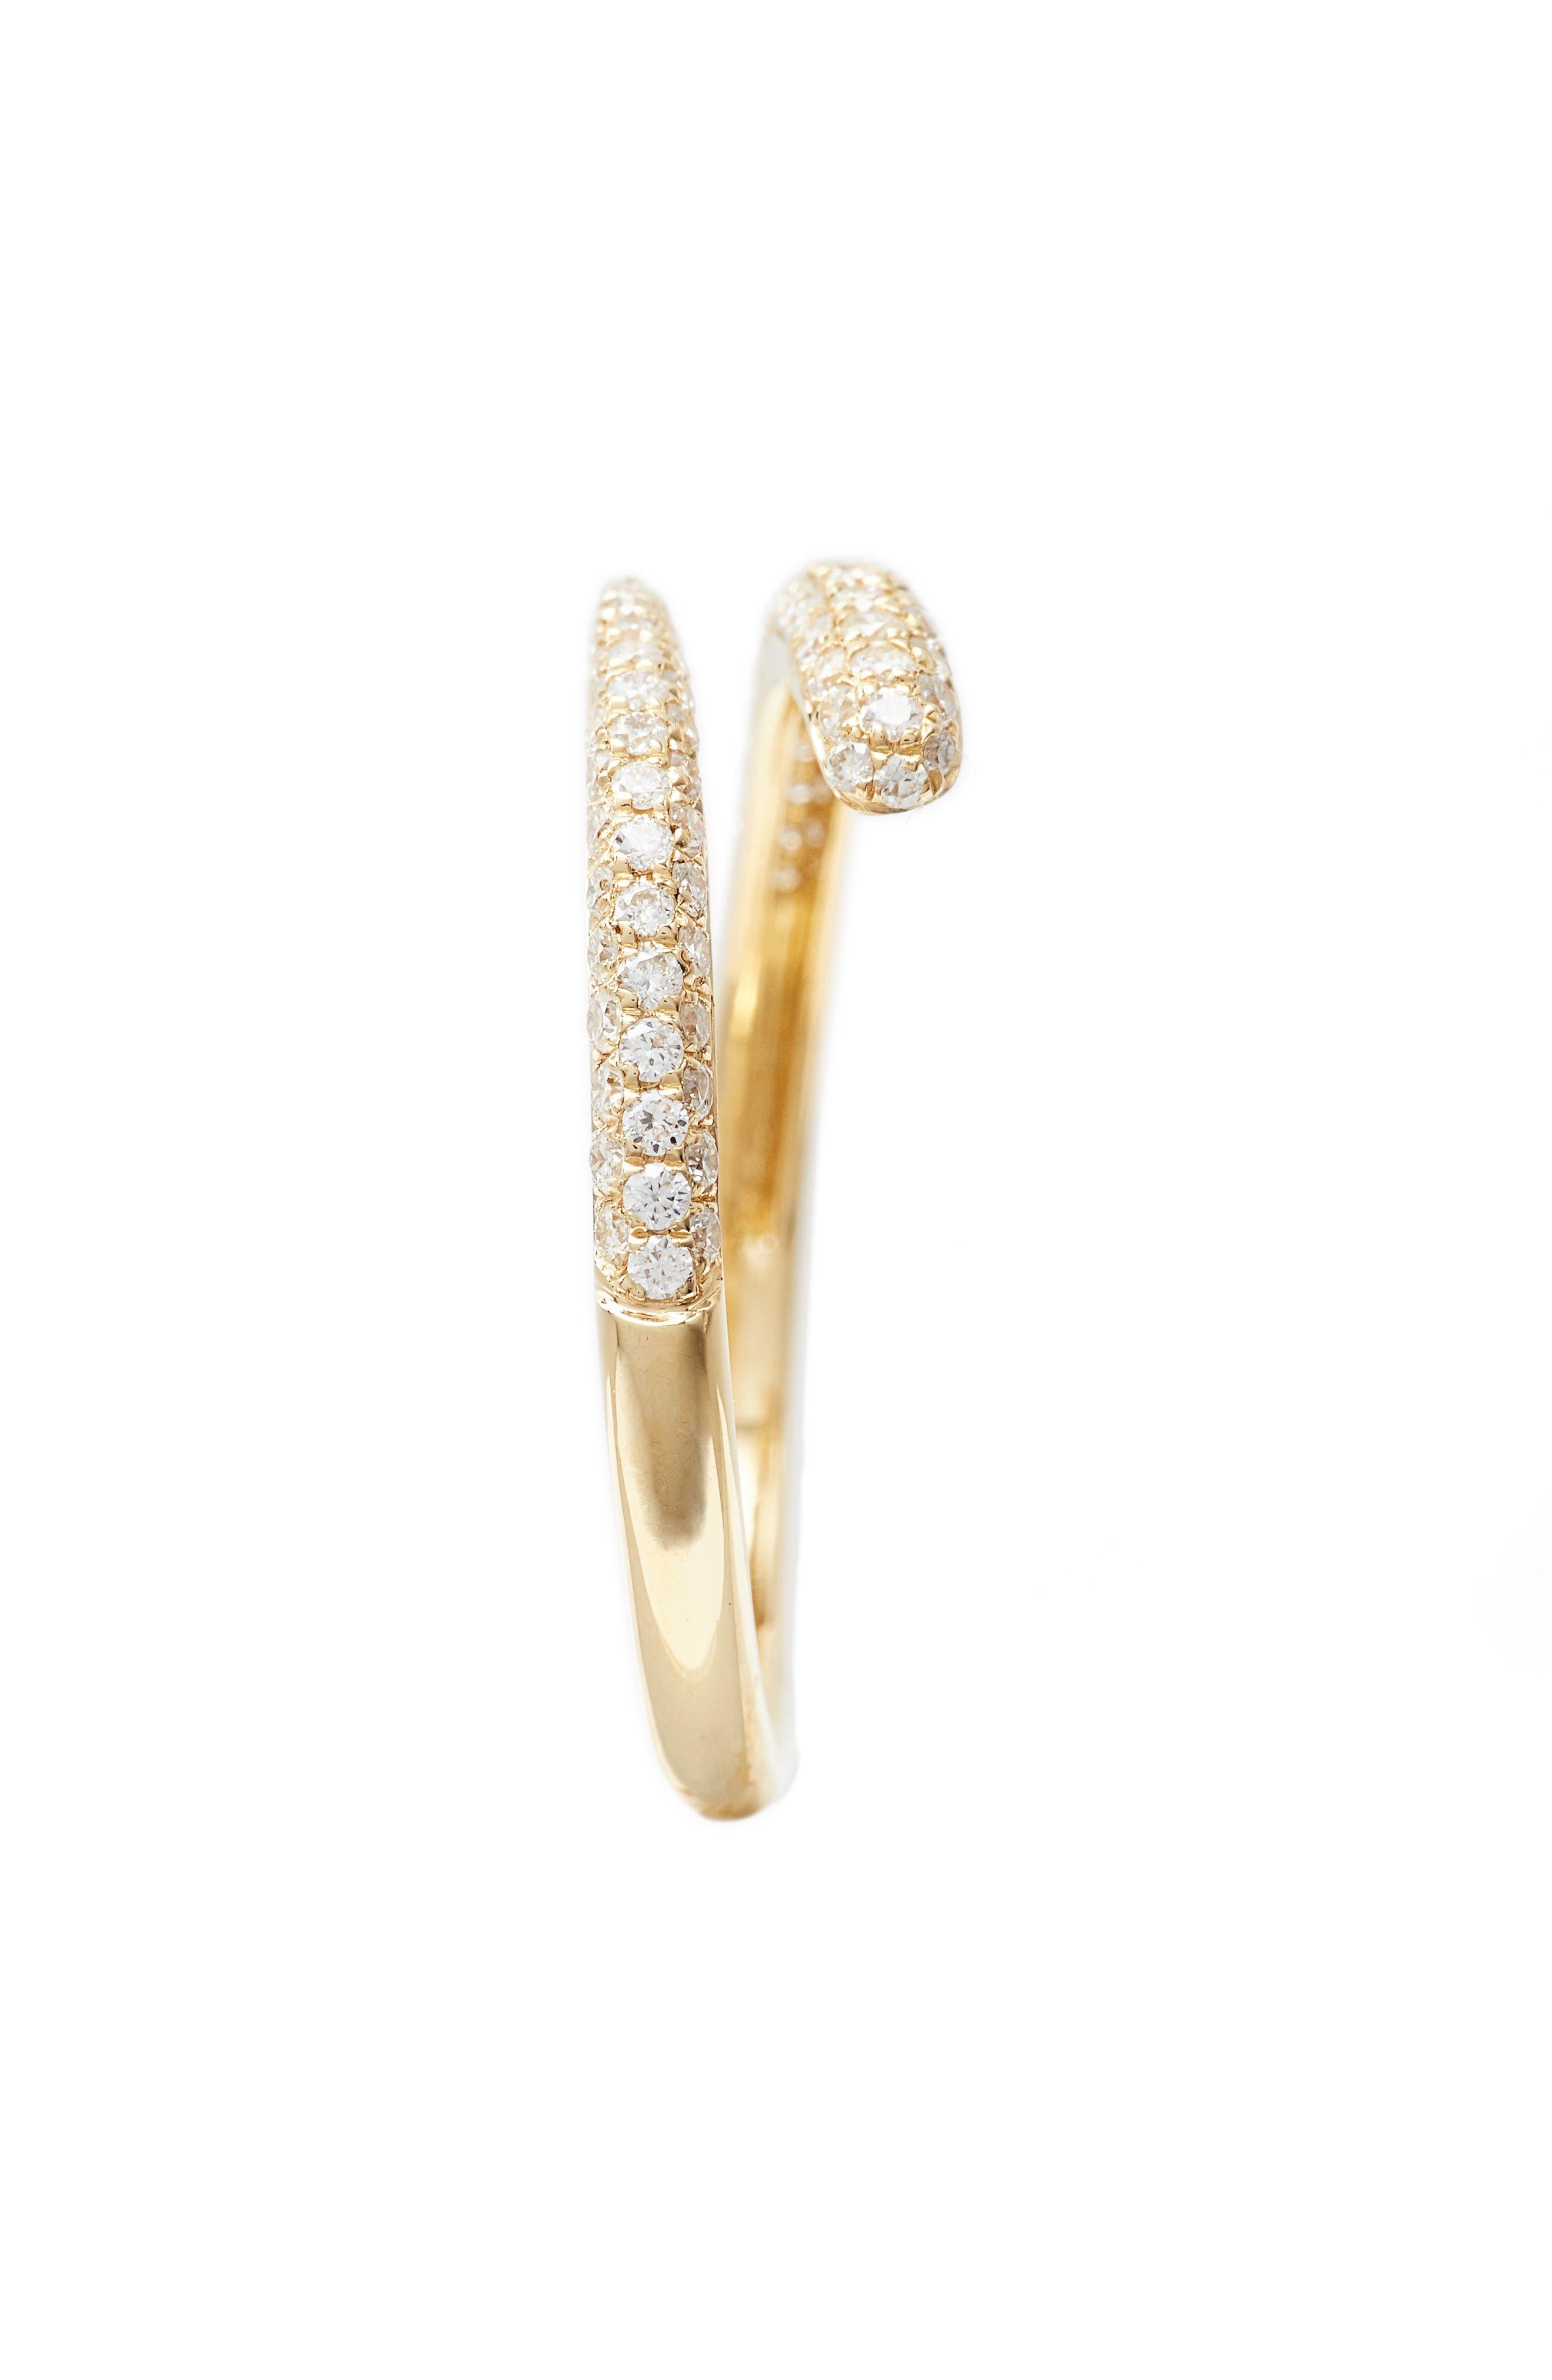 Micro Pavé Diamond Openwork Ring,                             Alternate thumbnail 2, color,                             Yellow Gold